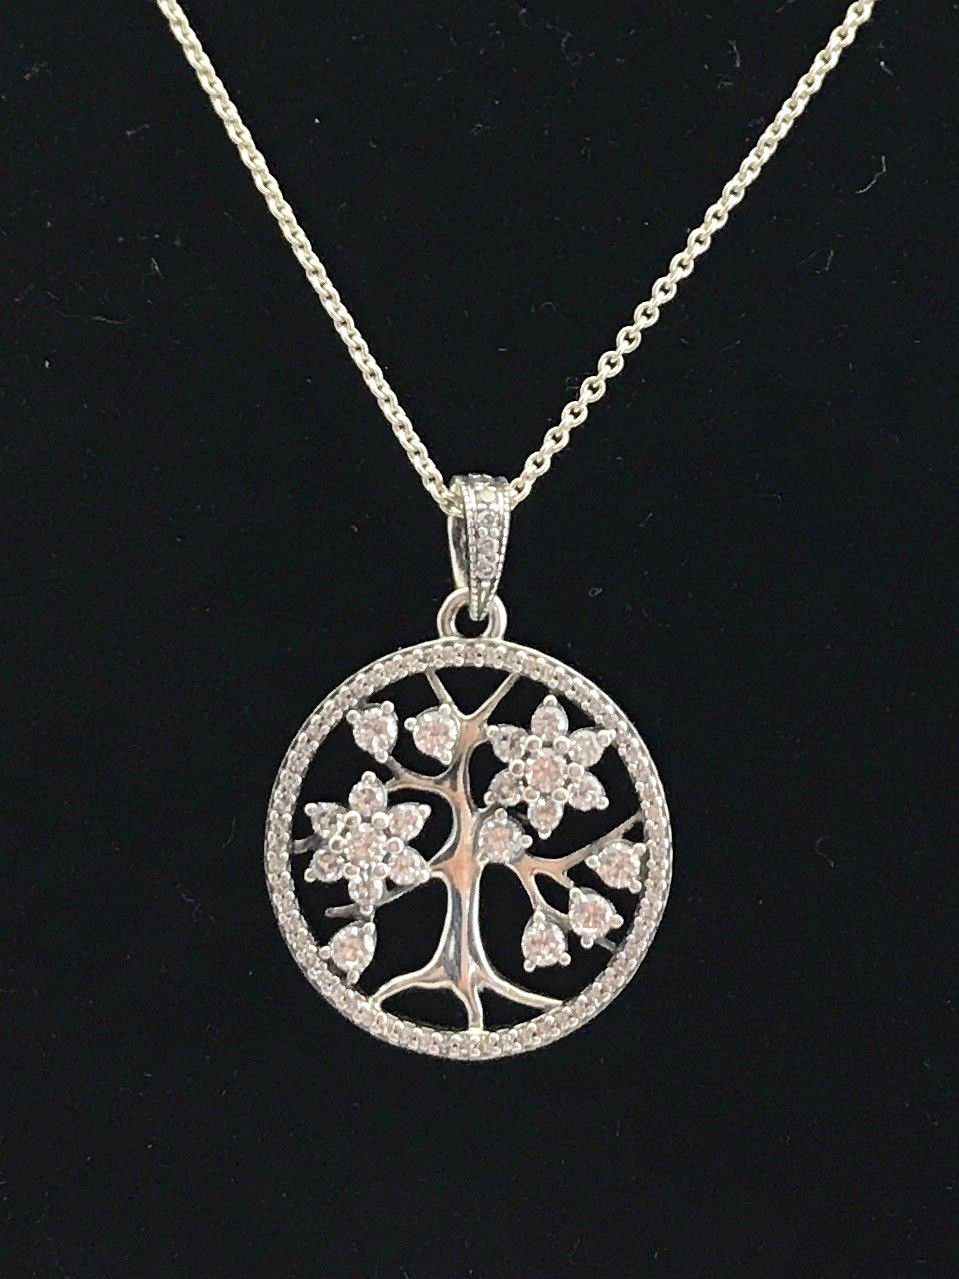 fba46677cc7ceb Authentic Pandora Family Tree Necklace, Clear CZ, 31.5